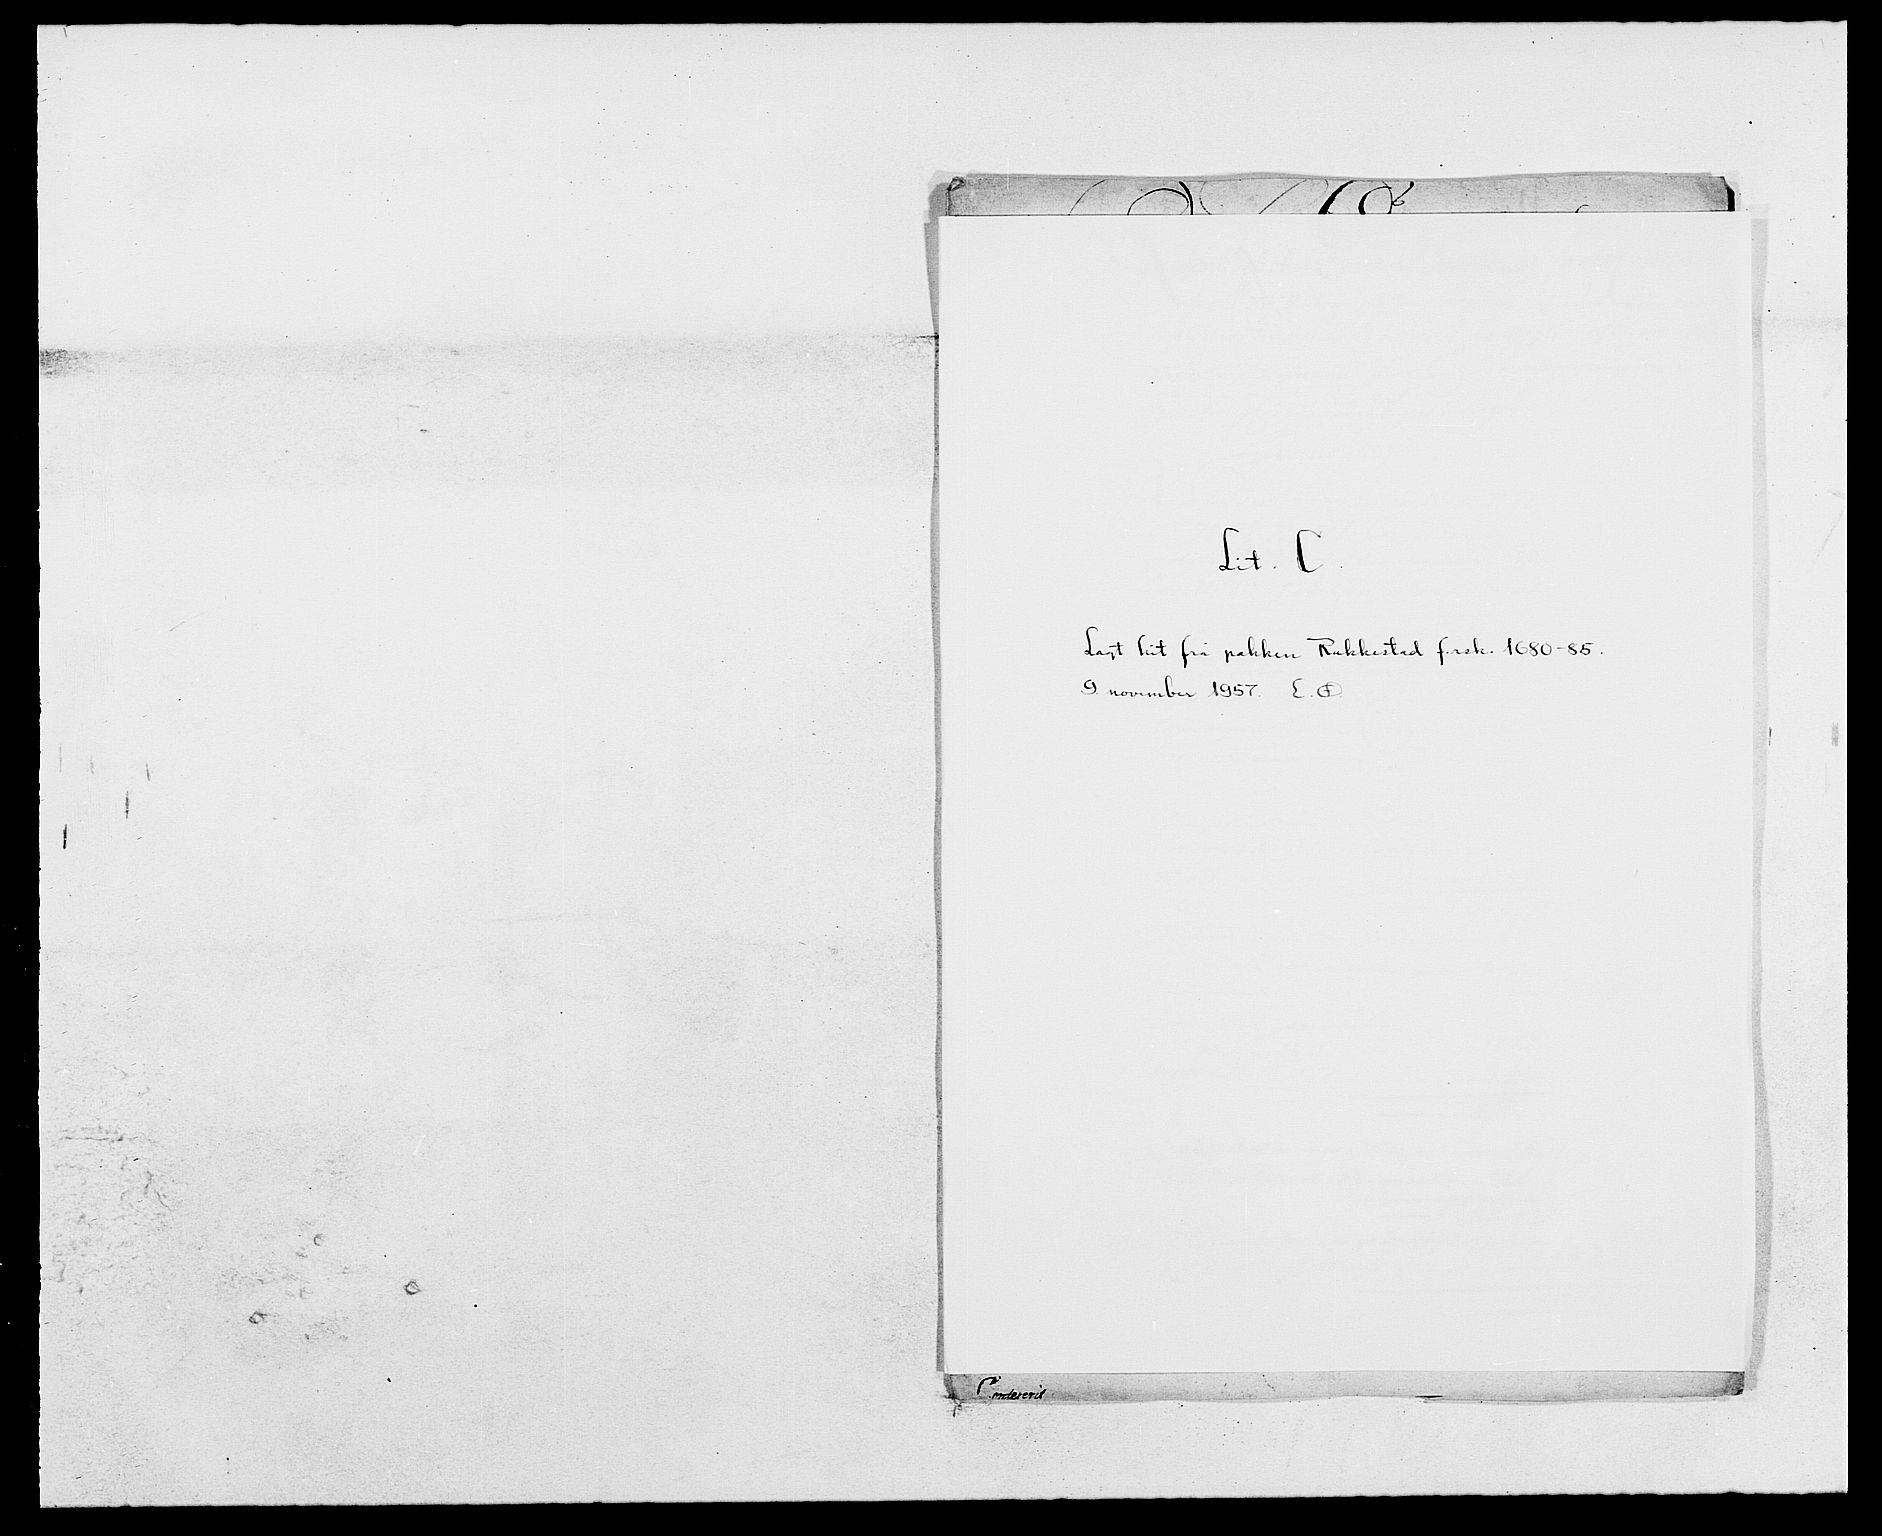 RA, Rentekammeret inntil 1814, Reviderte regnskaper, Fogderegnskap, R17/L1152: Fogderegnskap Gudbrandsdal, 1678-1679, s. 199